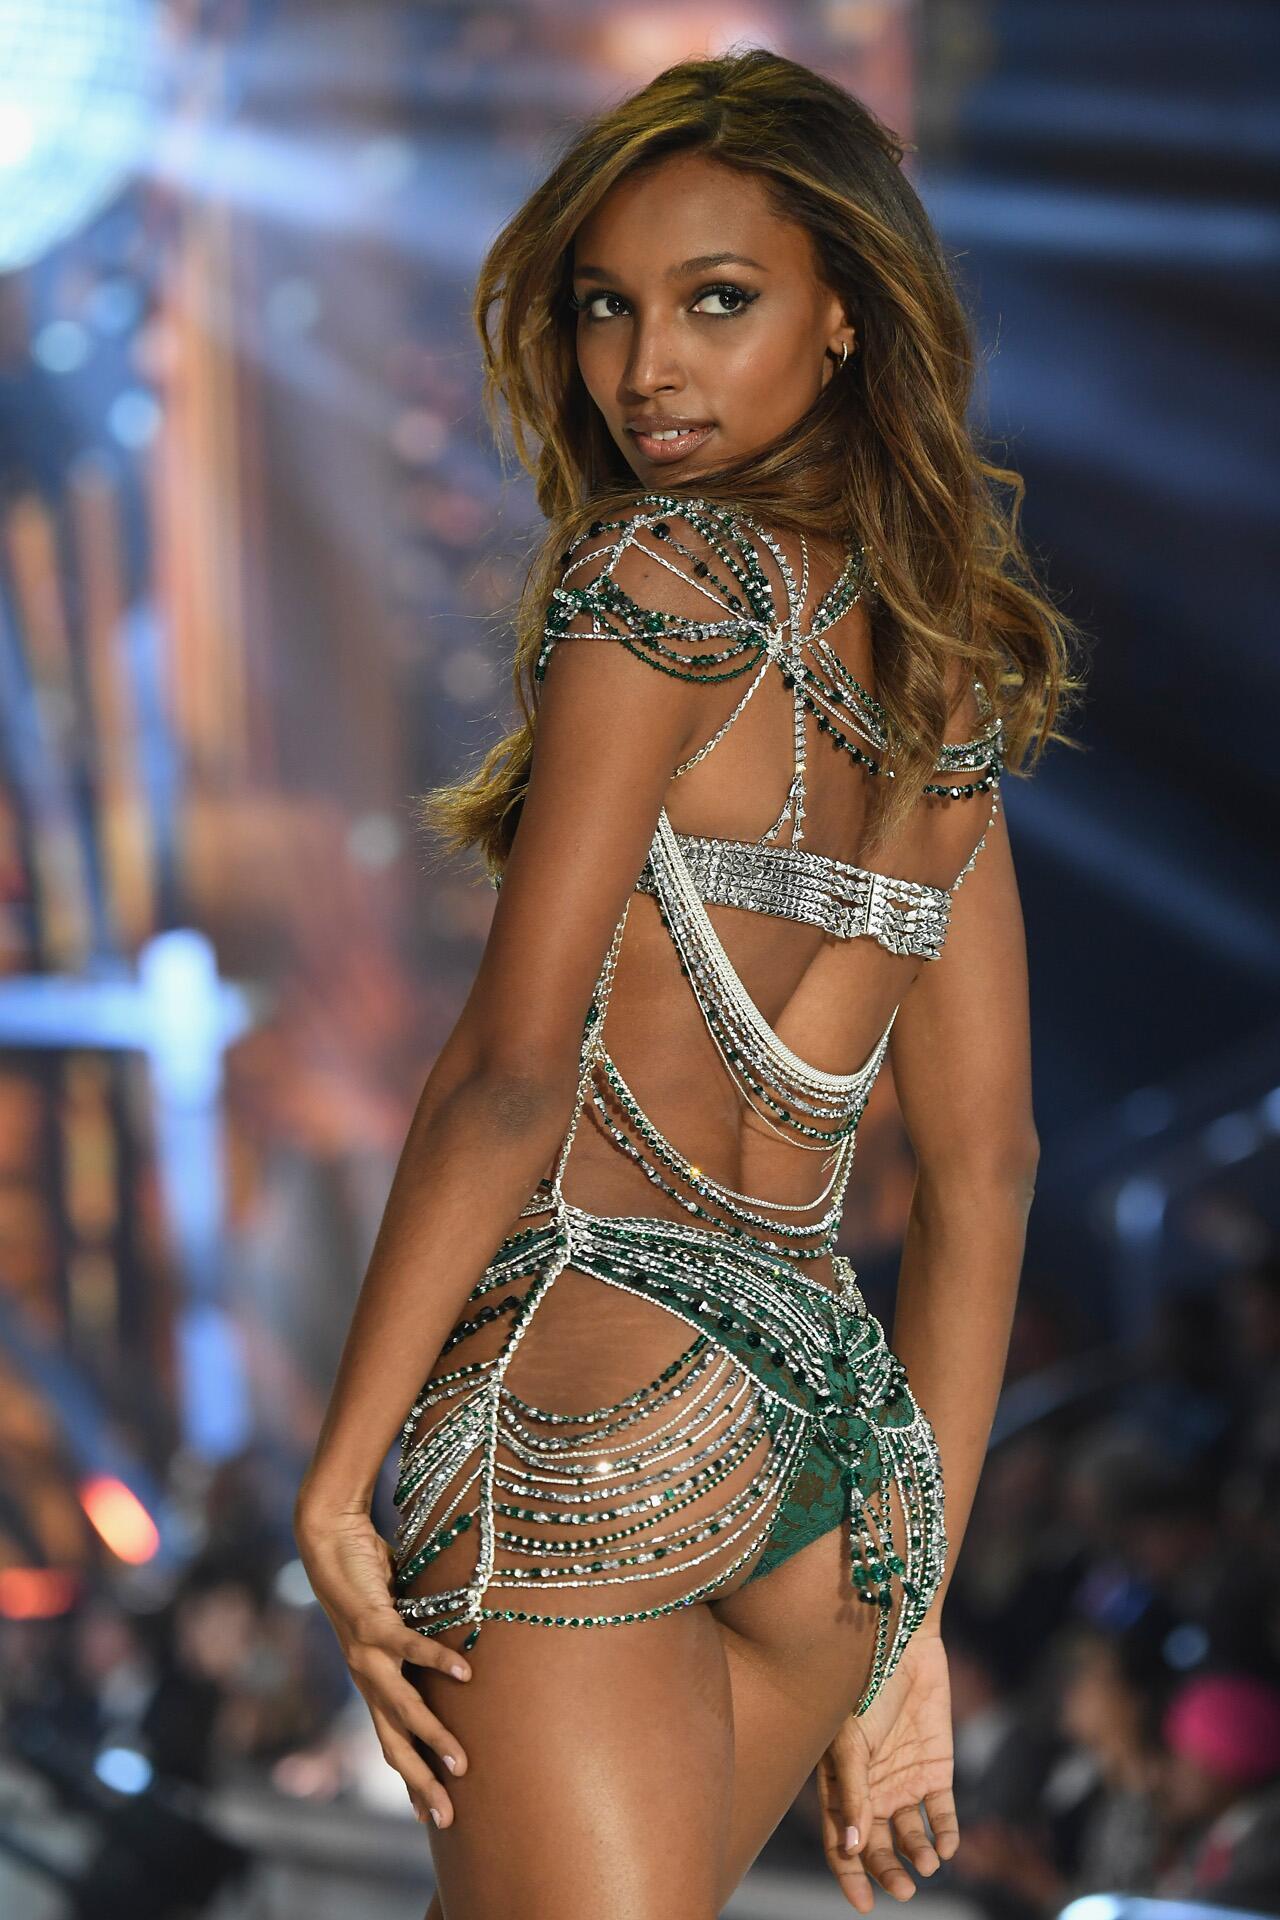 Bild zu Victoria's Secret, Paris 2016, Catwalk, Jasmine Tookes